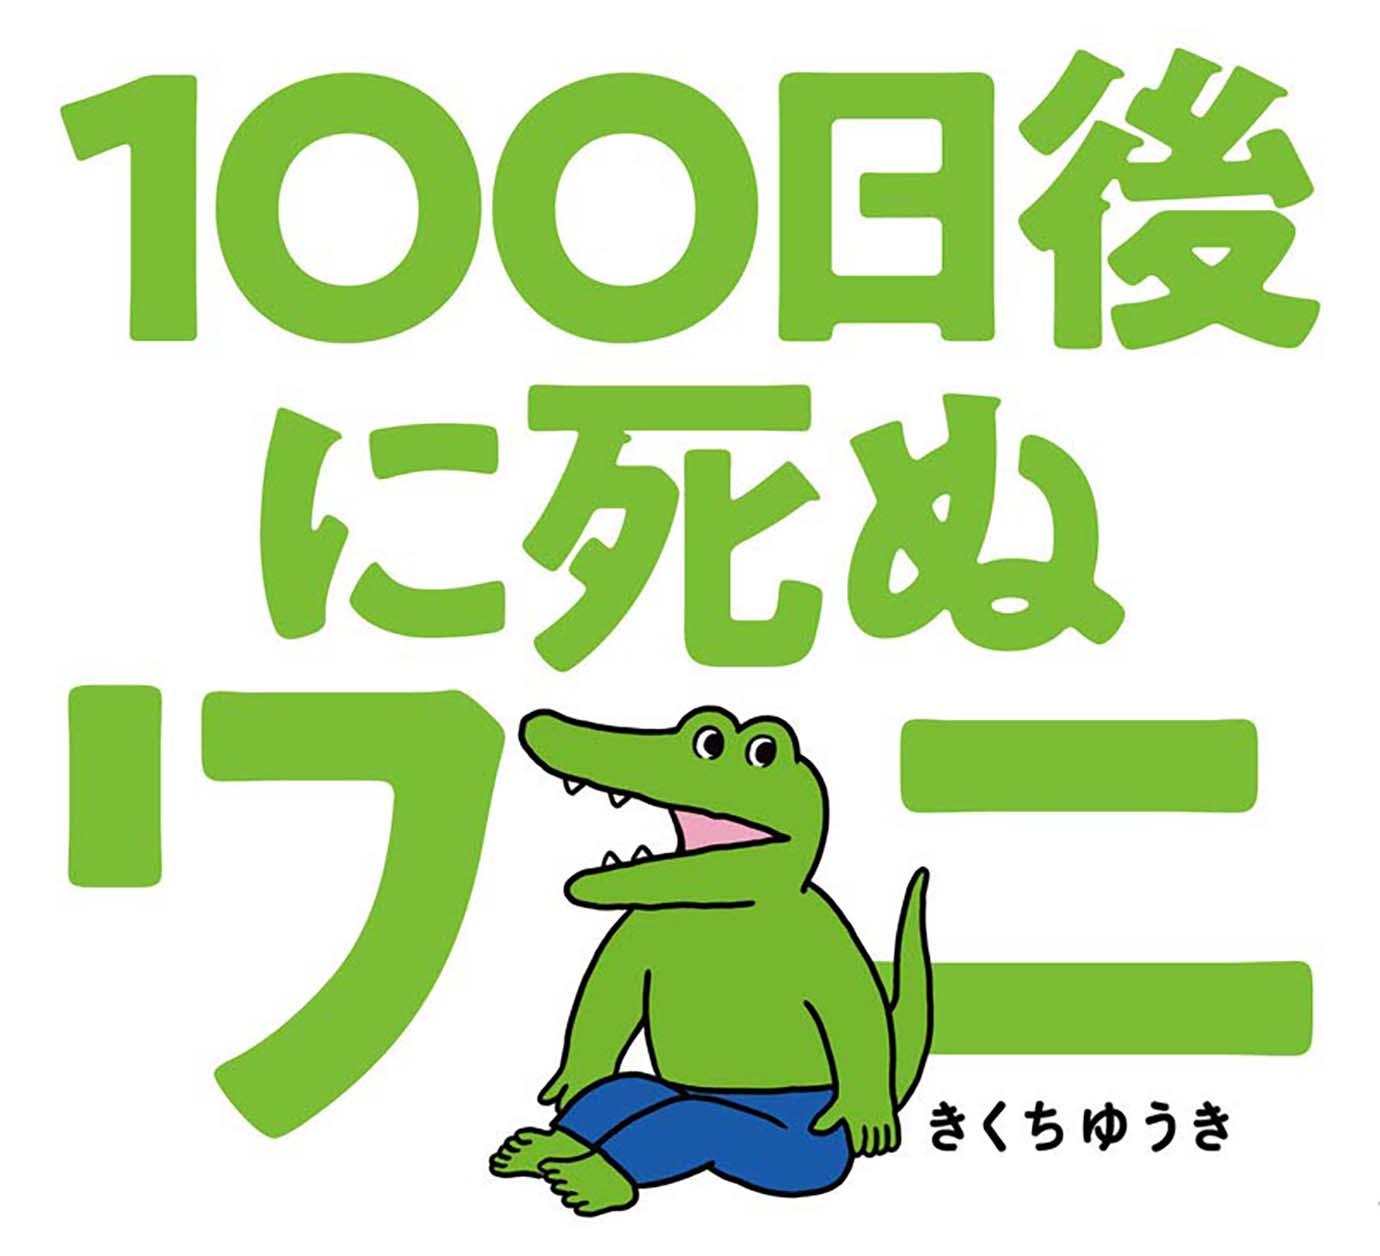 crocodile-dies-after-100-days